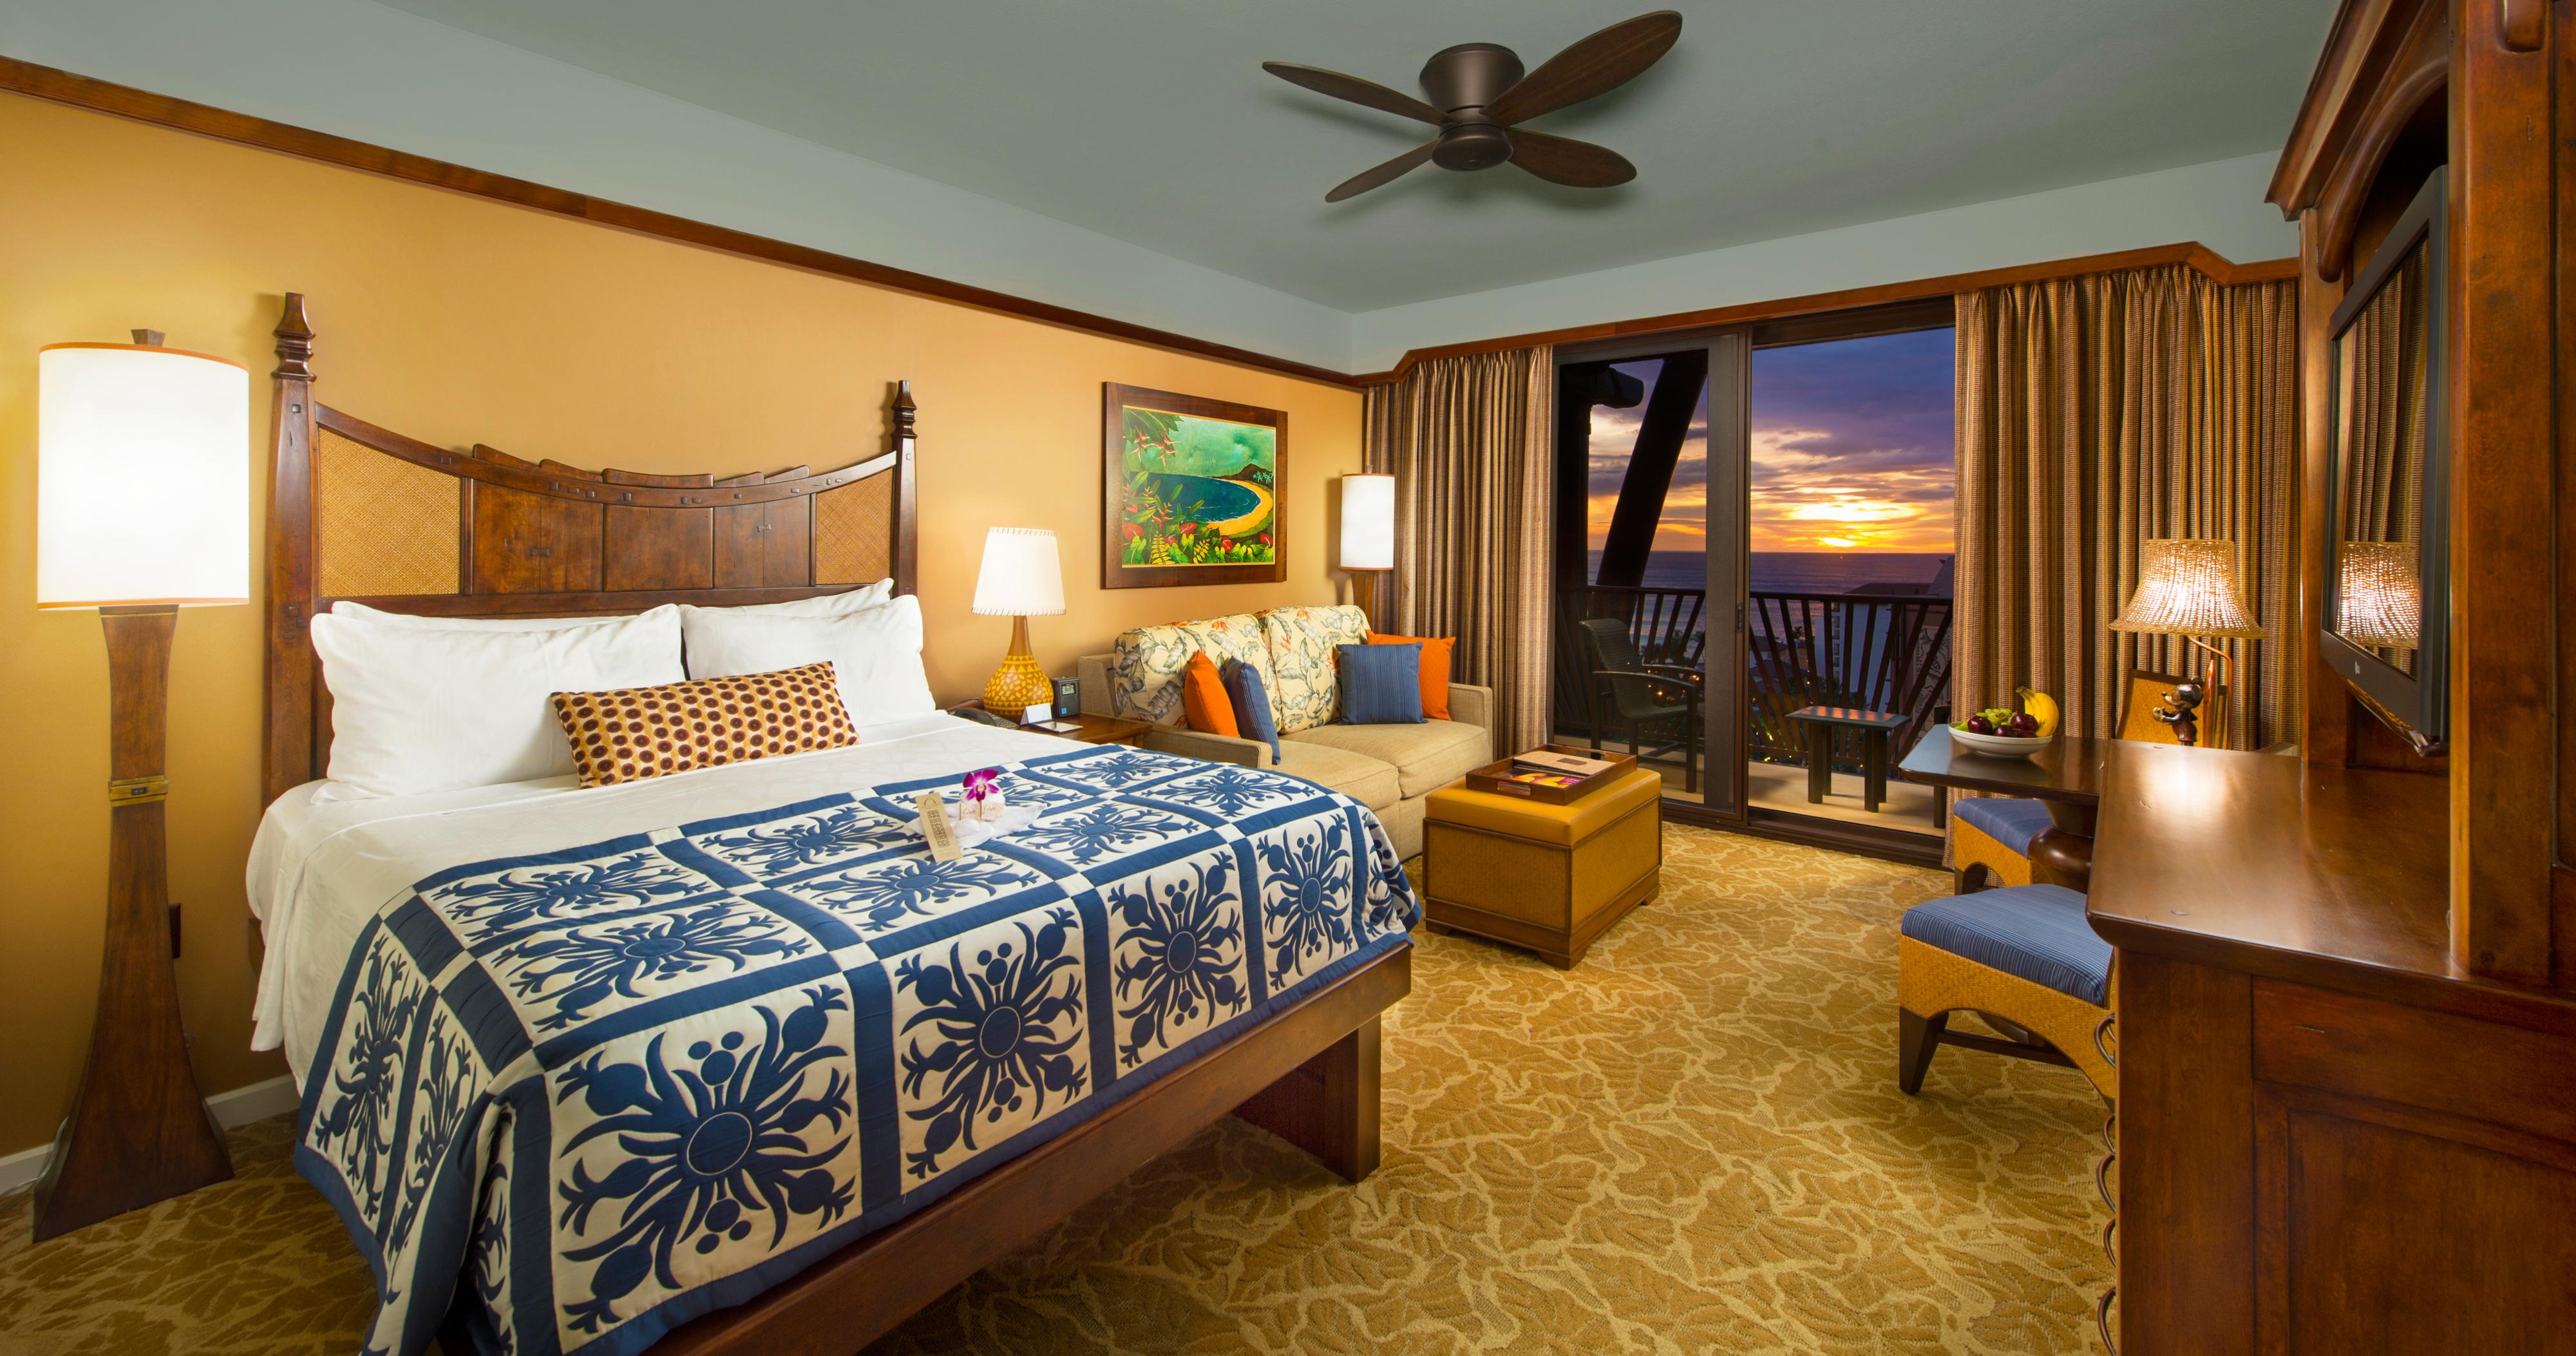 Deluxe Studio Rooms Aulani Hawaii Resort Amp Spa